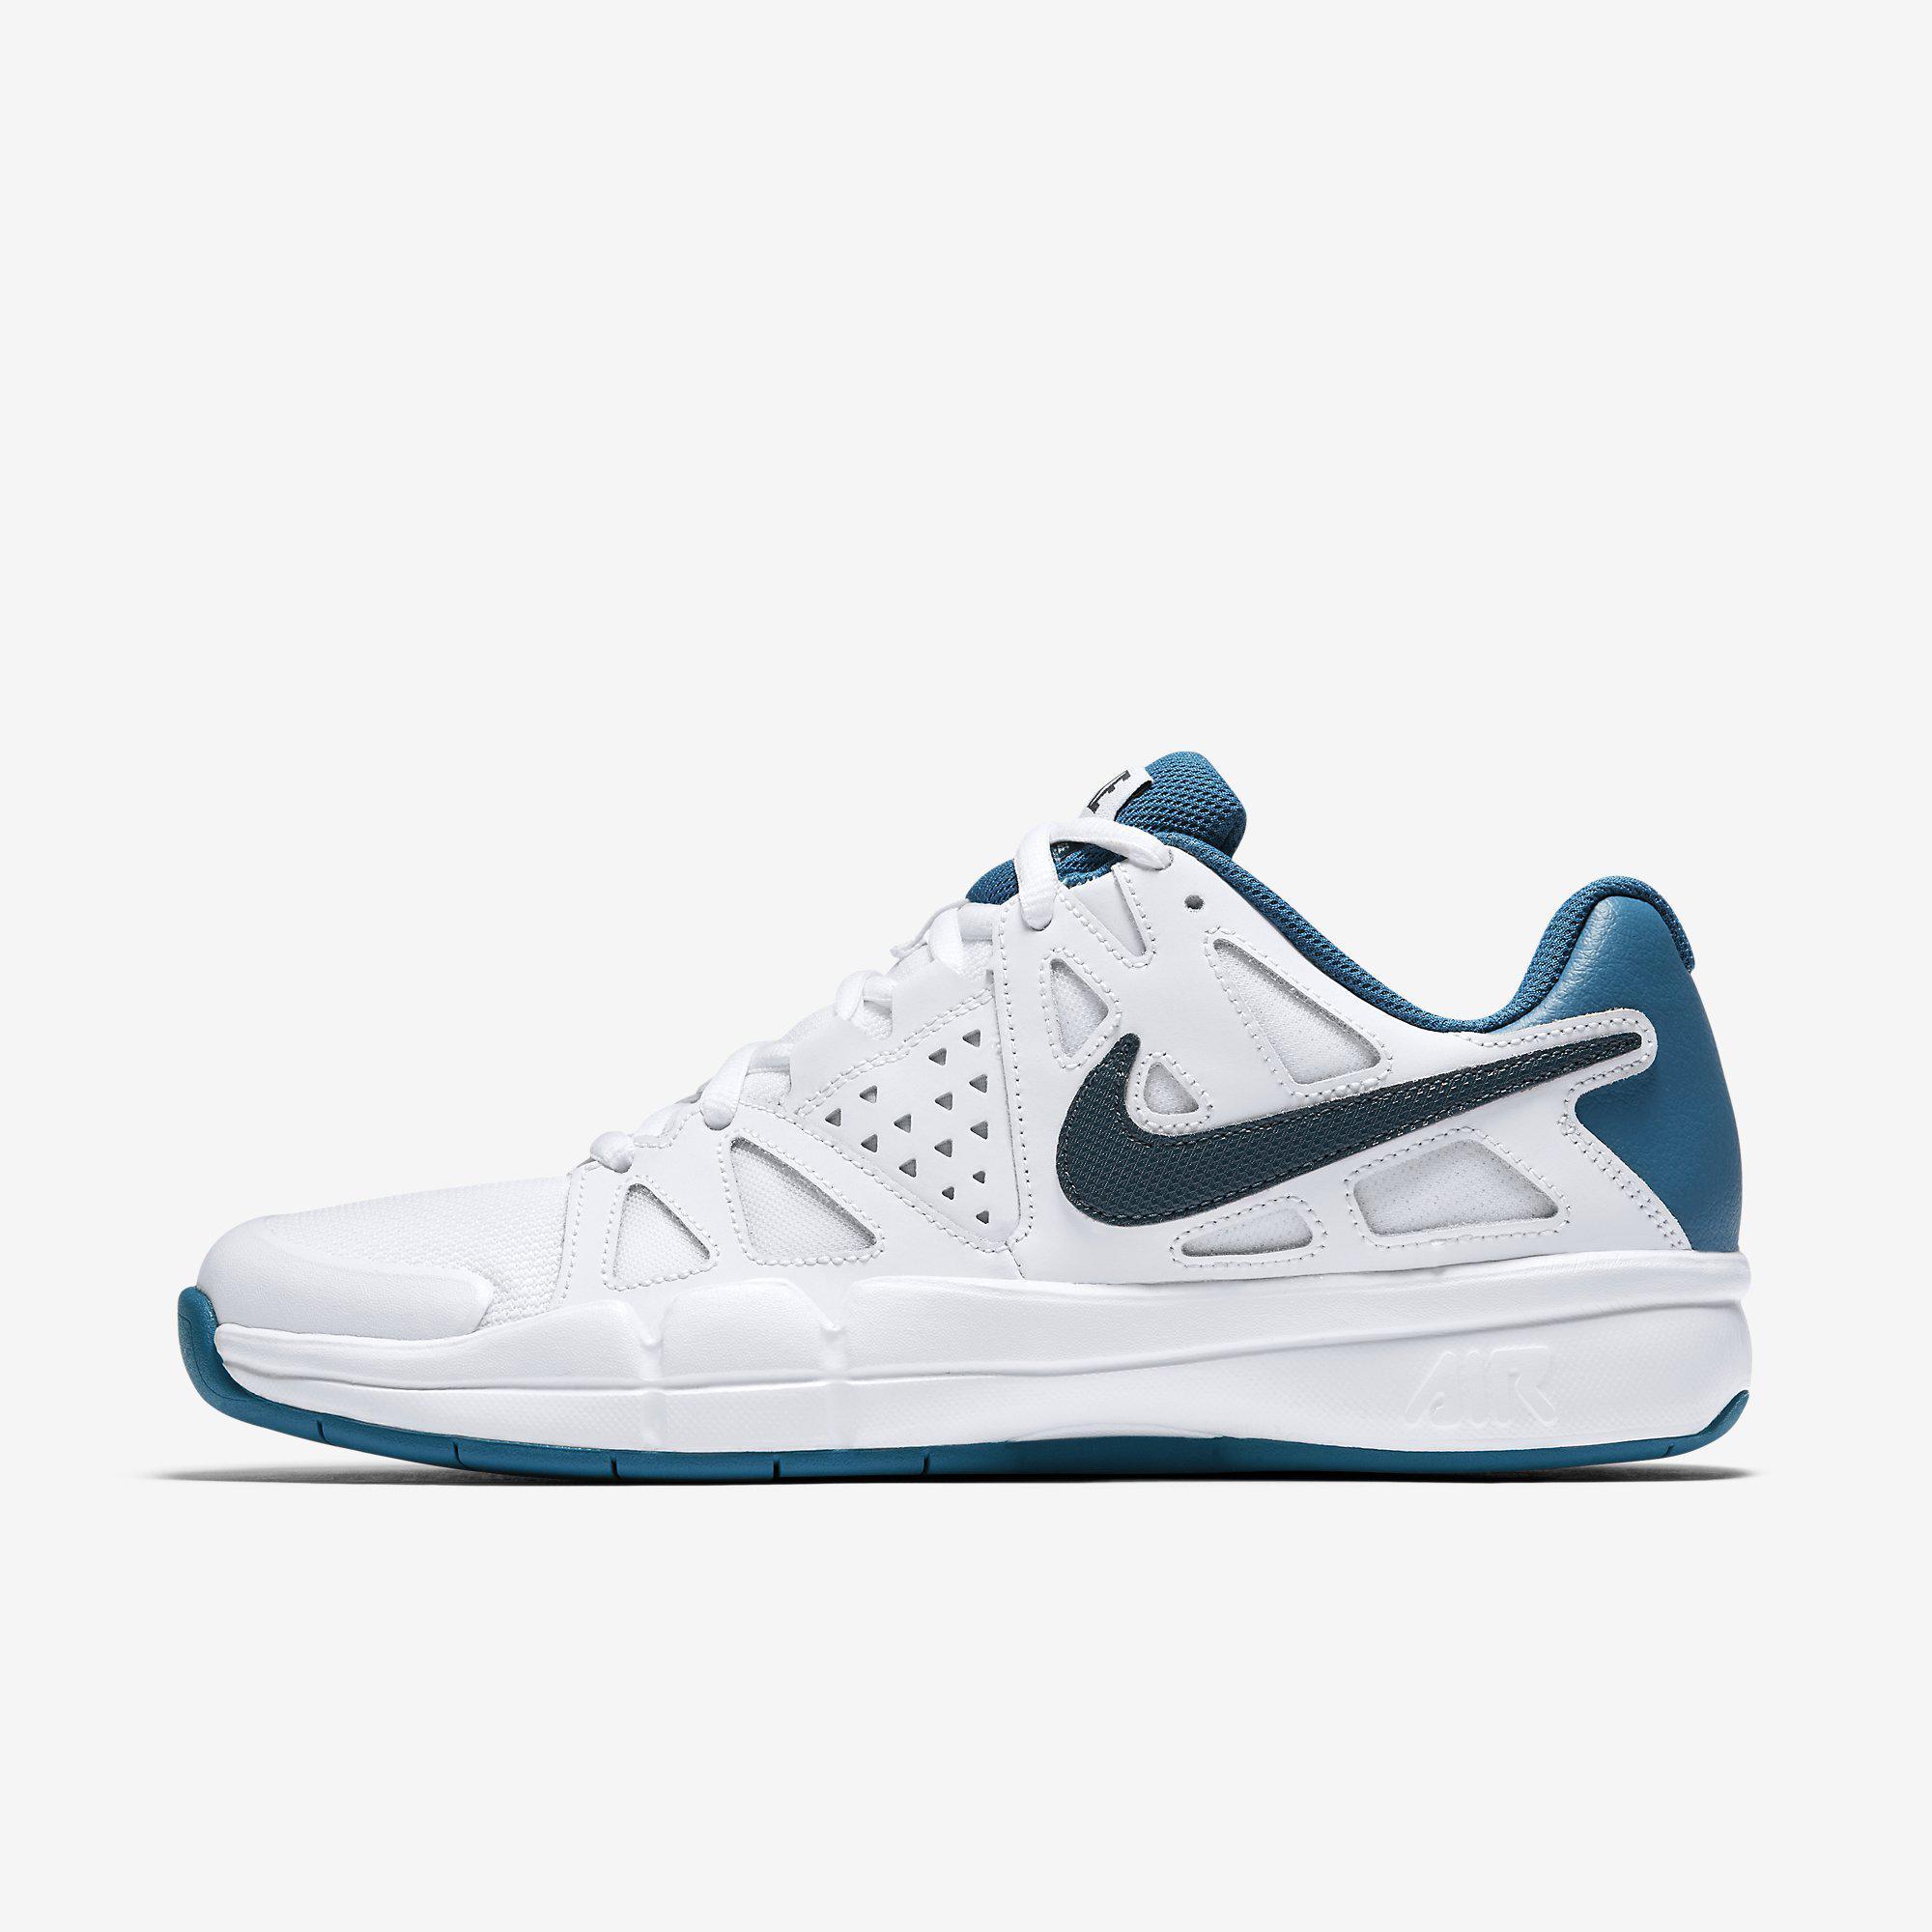 Nike Mens Air Vapor Advantage Carpet Tennis Shoes White